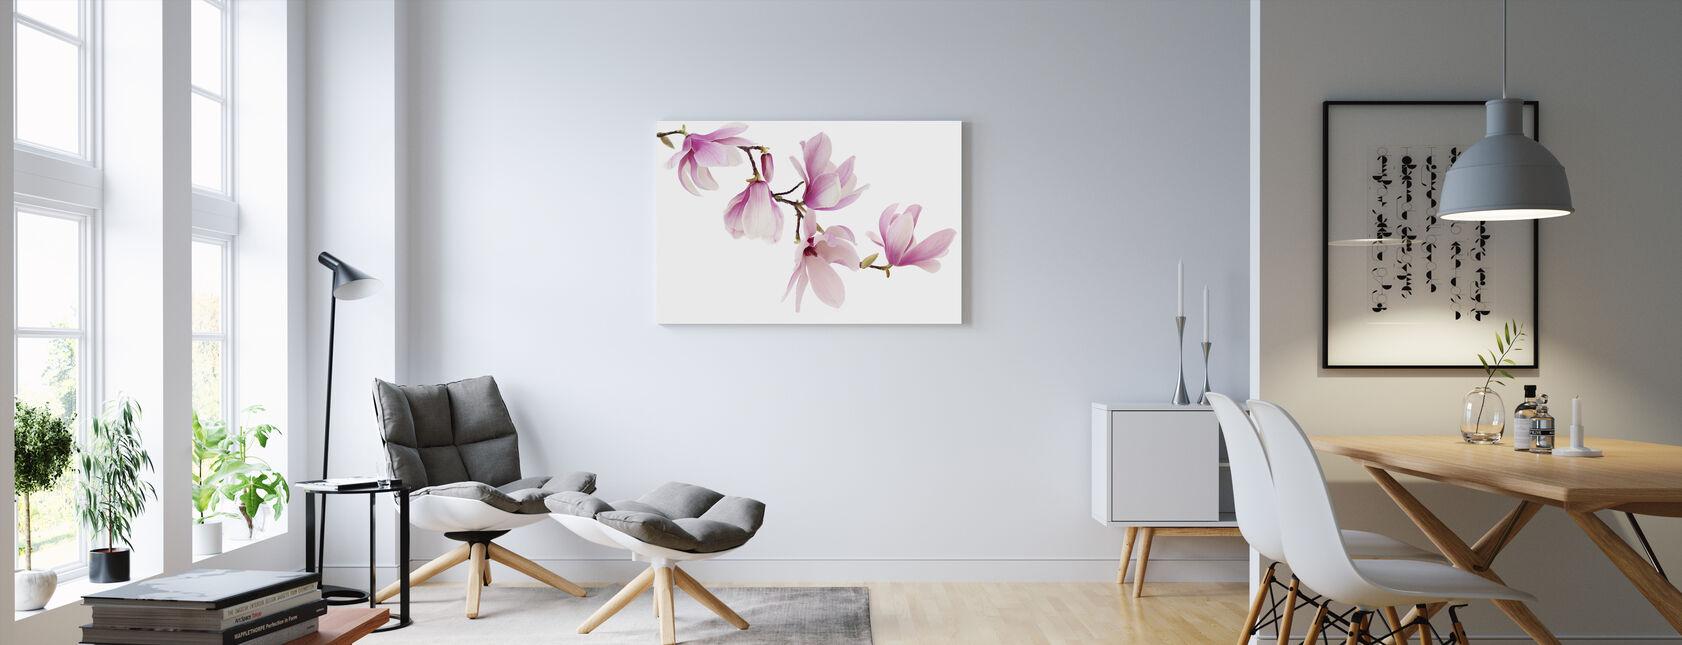 Spring Magnolia - Canvas print - Living Room